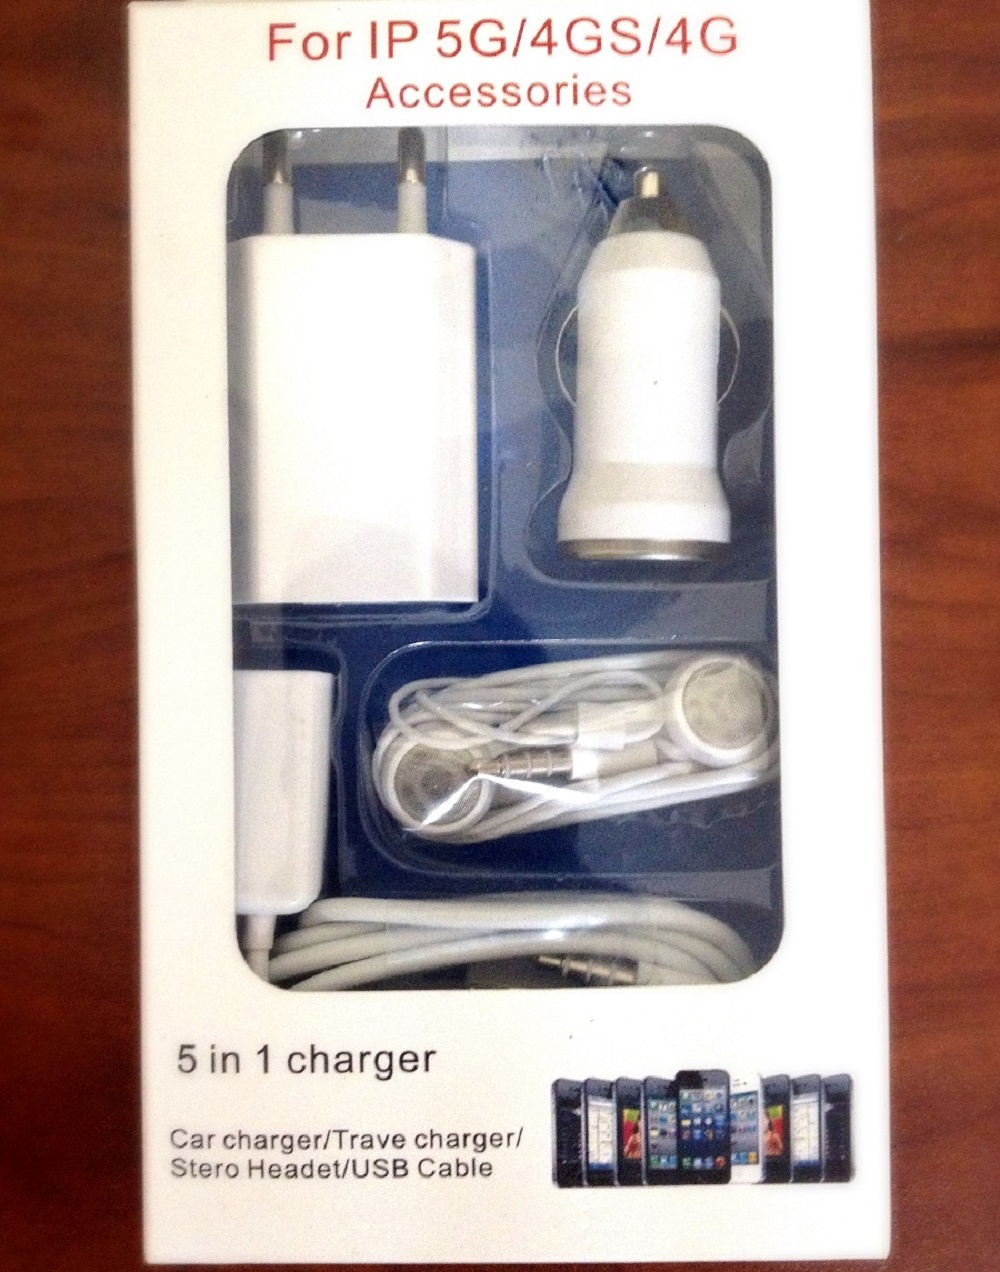 شارژر همراه همه کاره مخصوص آیفون 5in 1